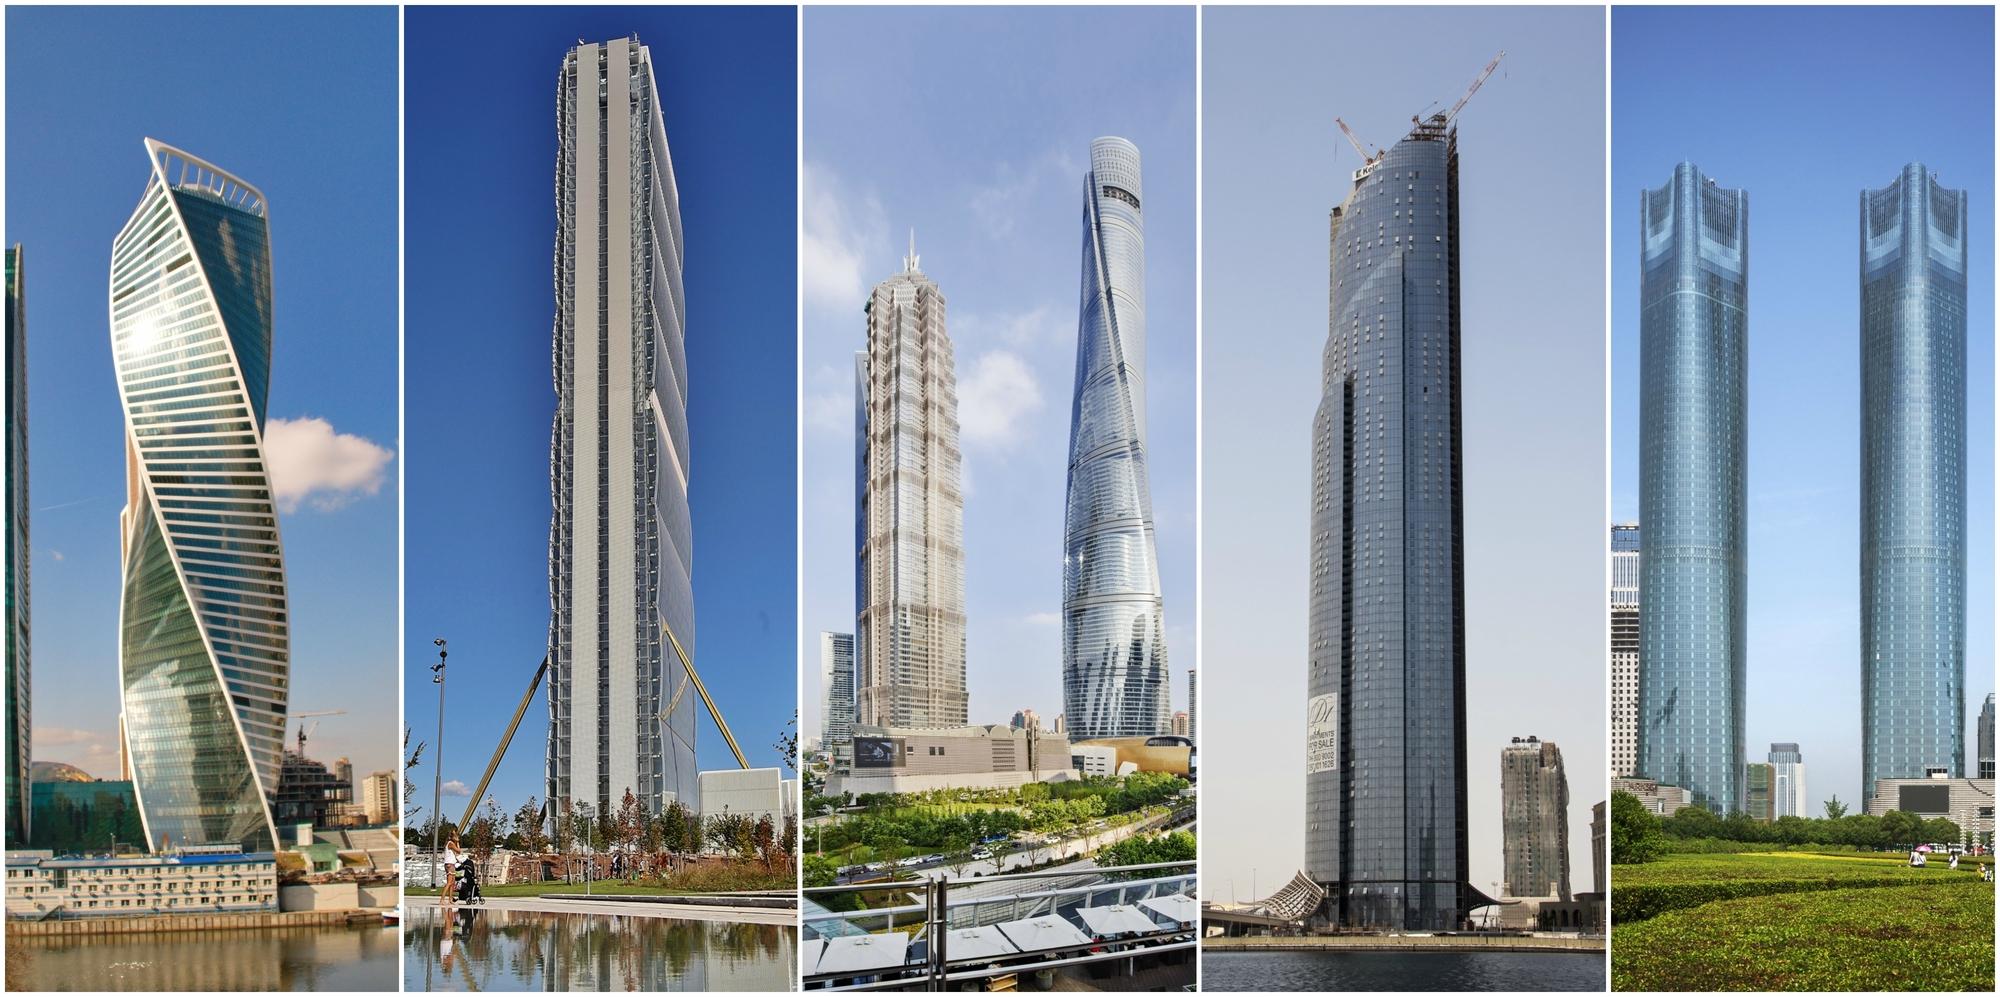 Shanghai Tower Wins 2015 Emporis Skyscraper Award Archdaily